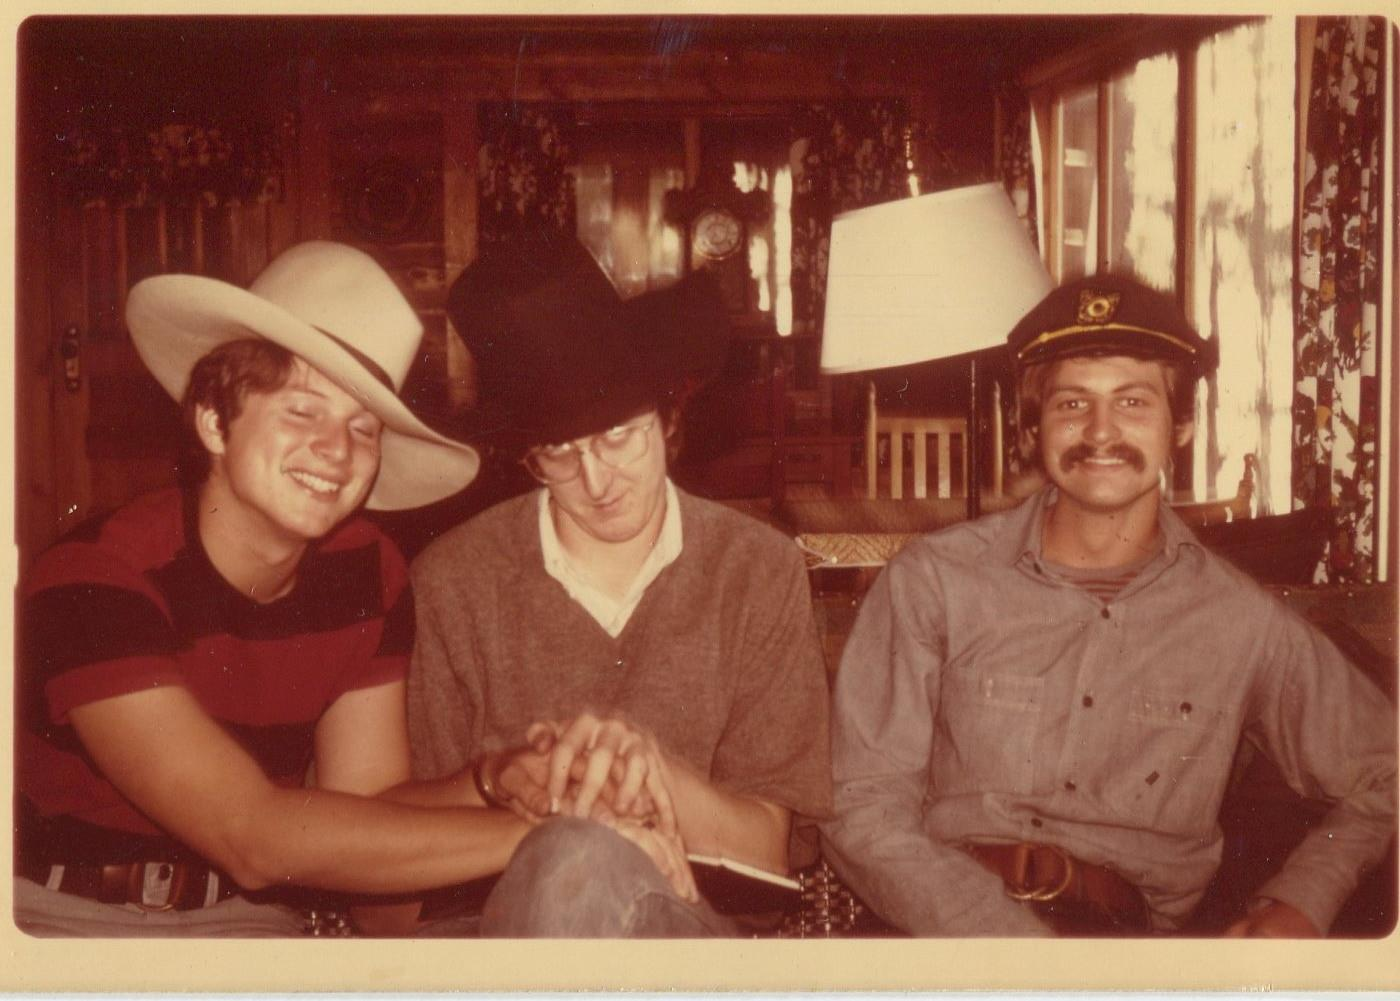 Stephen Bruton, Austin's Mentor: 1948- 2009 | MichaelCorcoran net